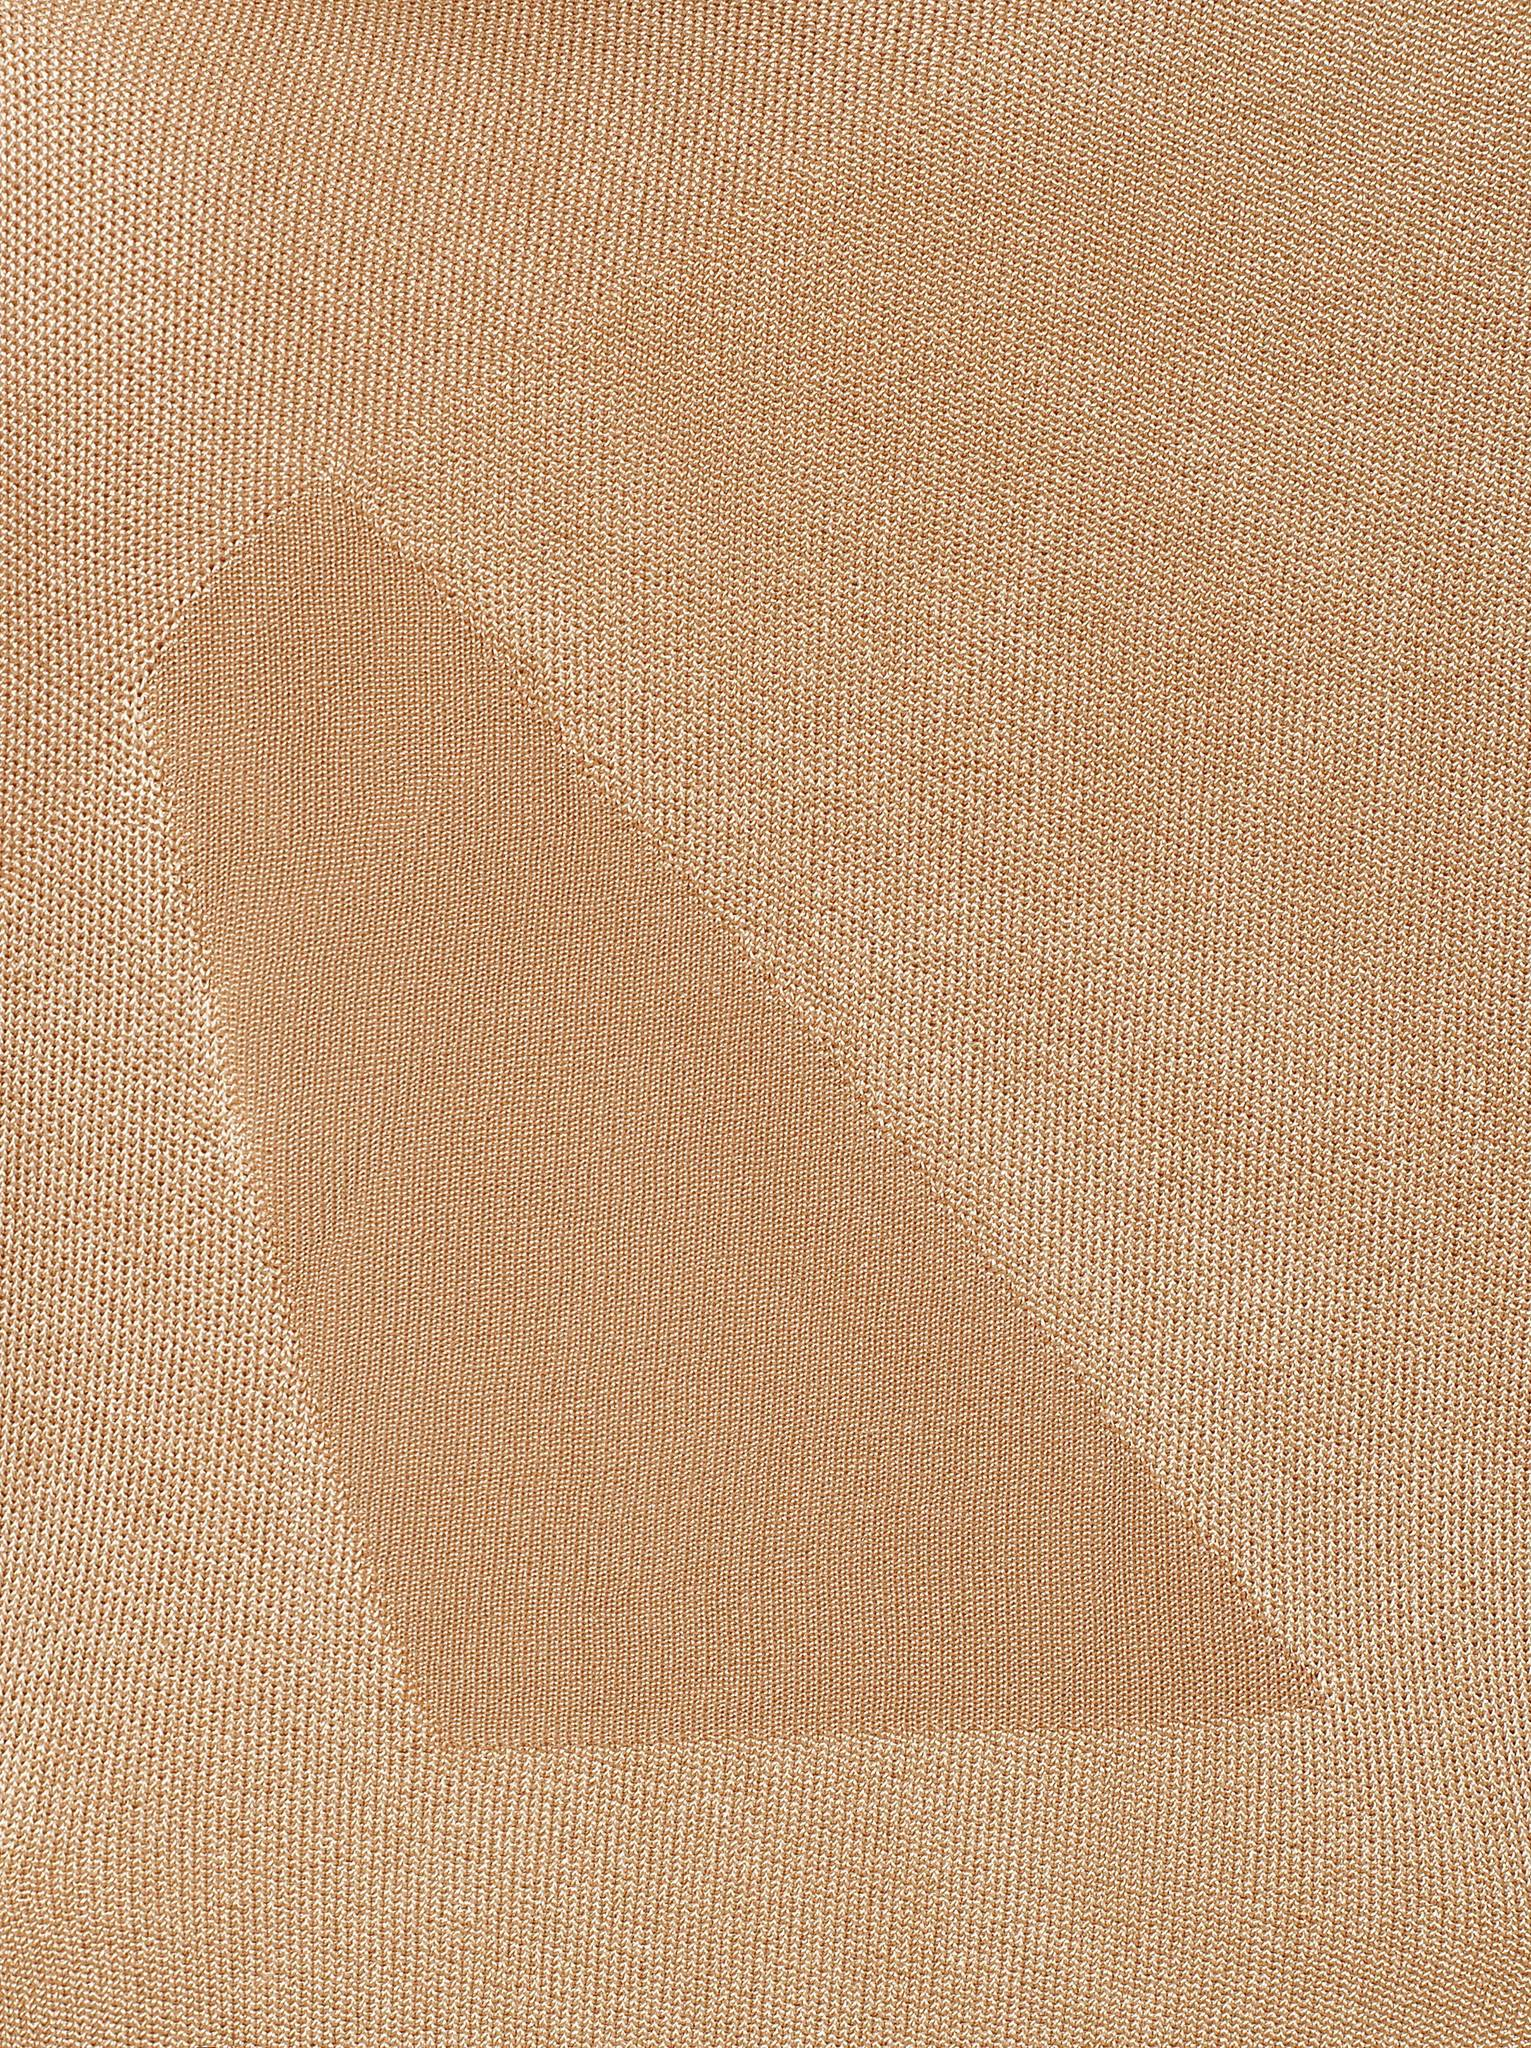 Леггинсы-шорты женские X-PRESS SHORTS